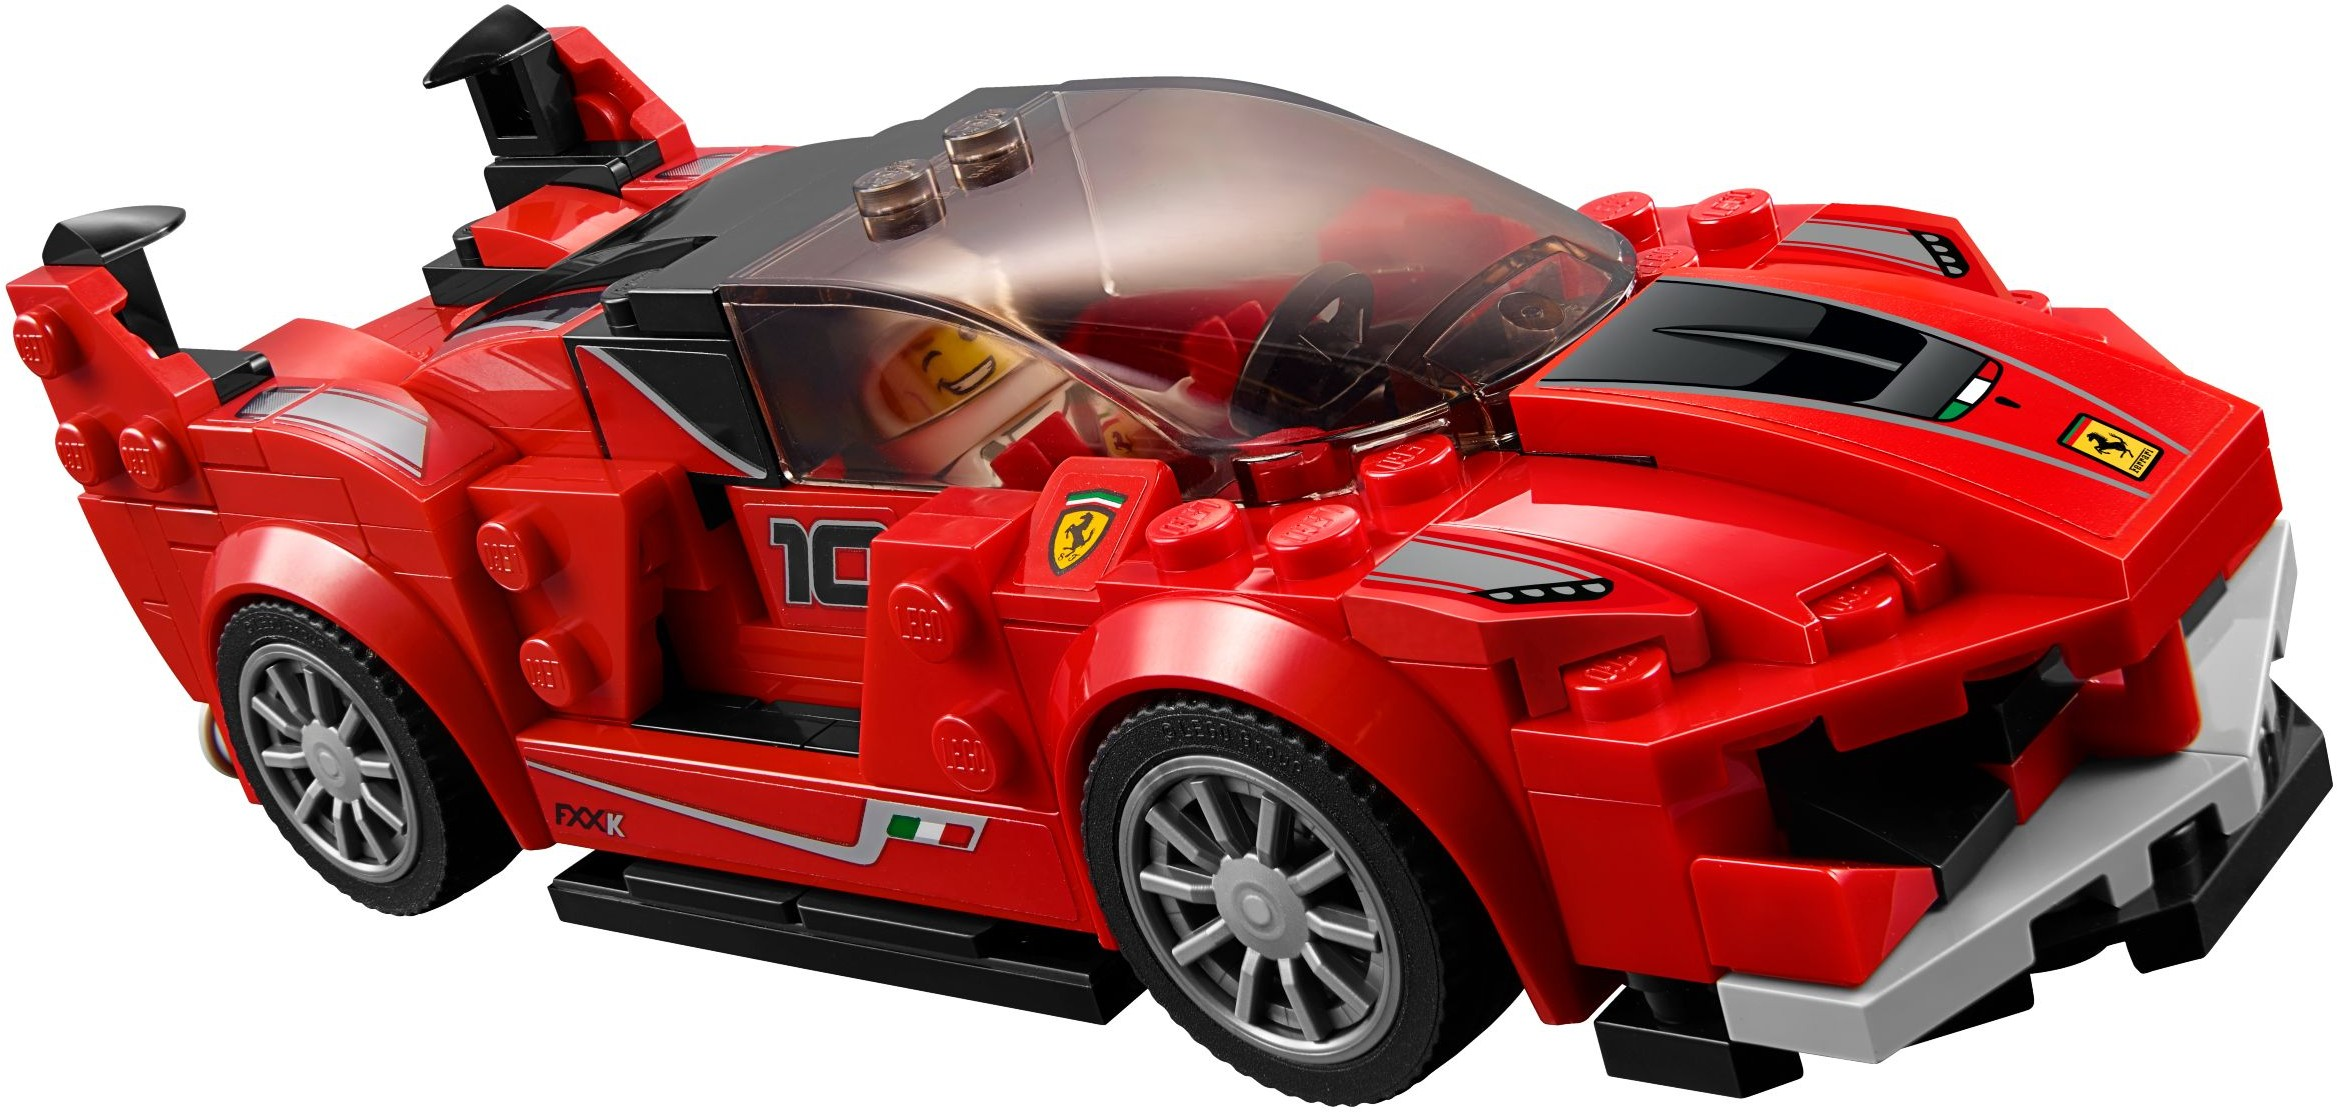 75882: LEGO® Speed Champions Ferrari FXX K & Development ...